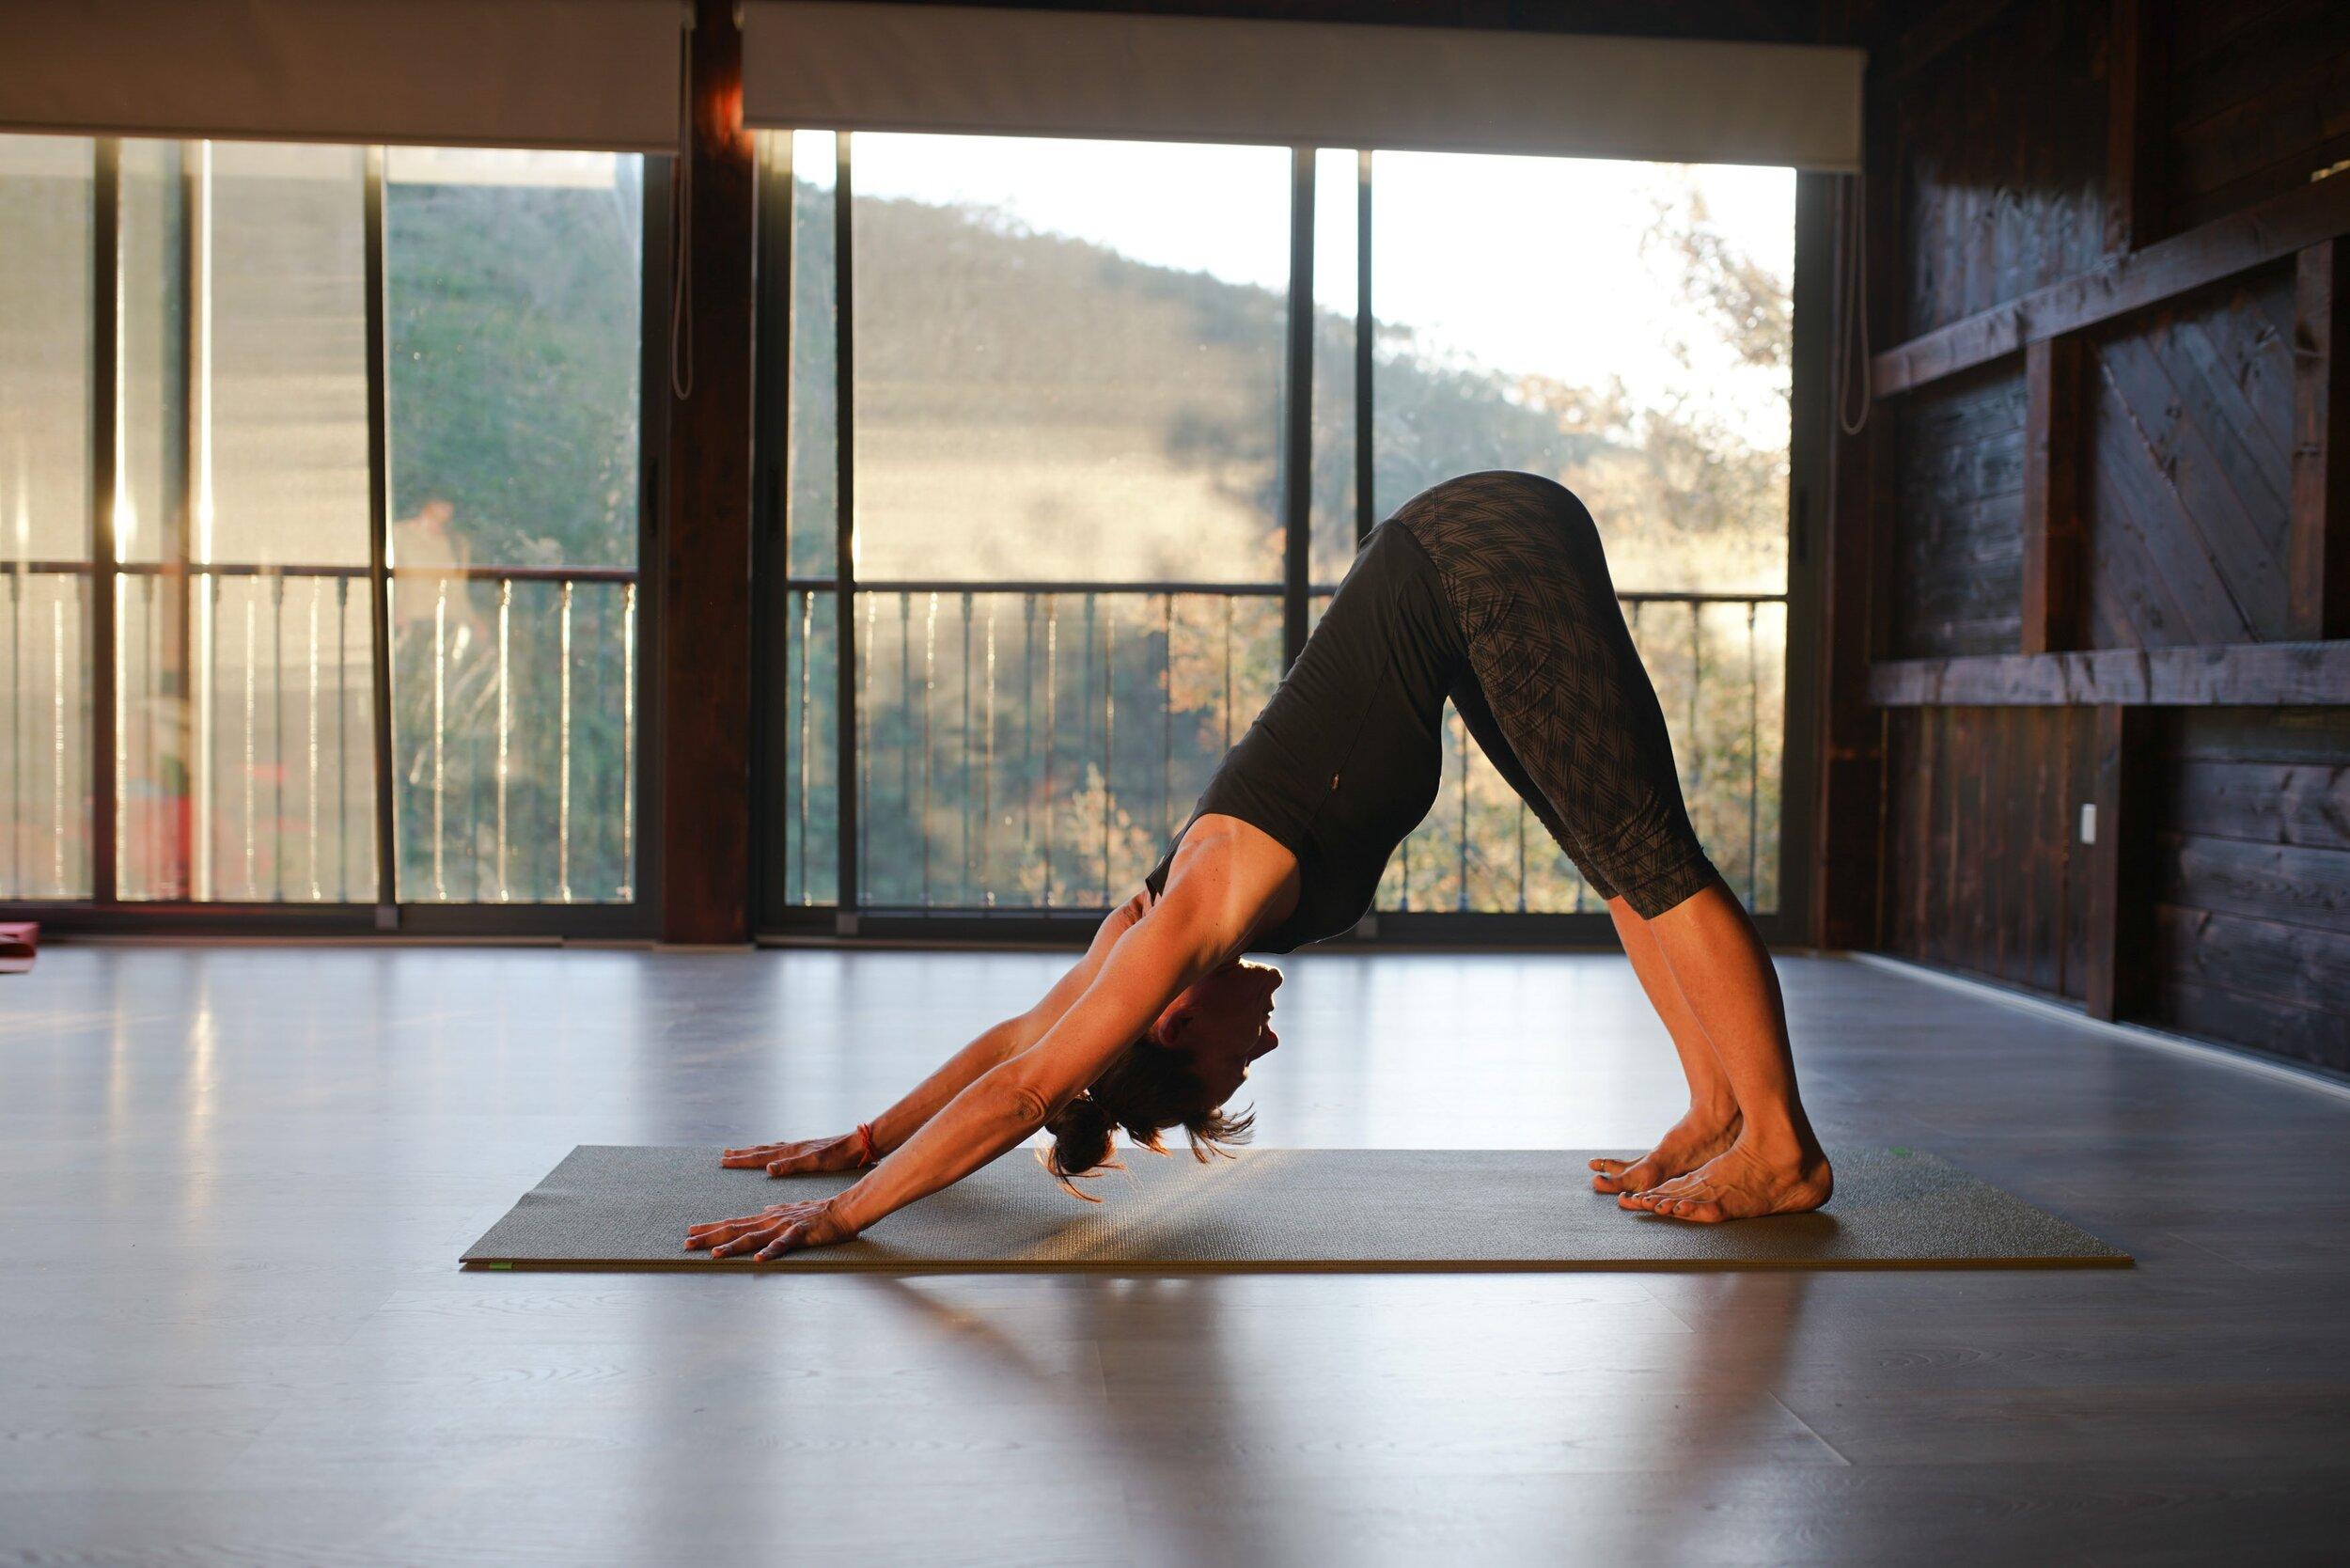 tashi-dawa-yoga-teacher-portugal.jpg